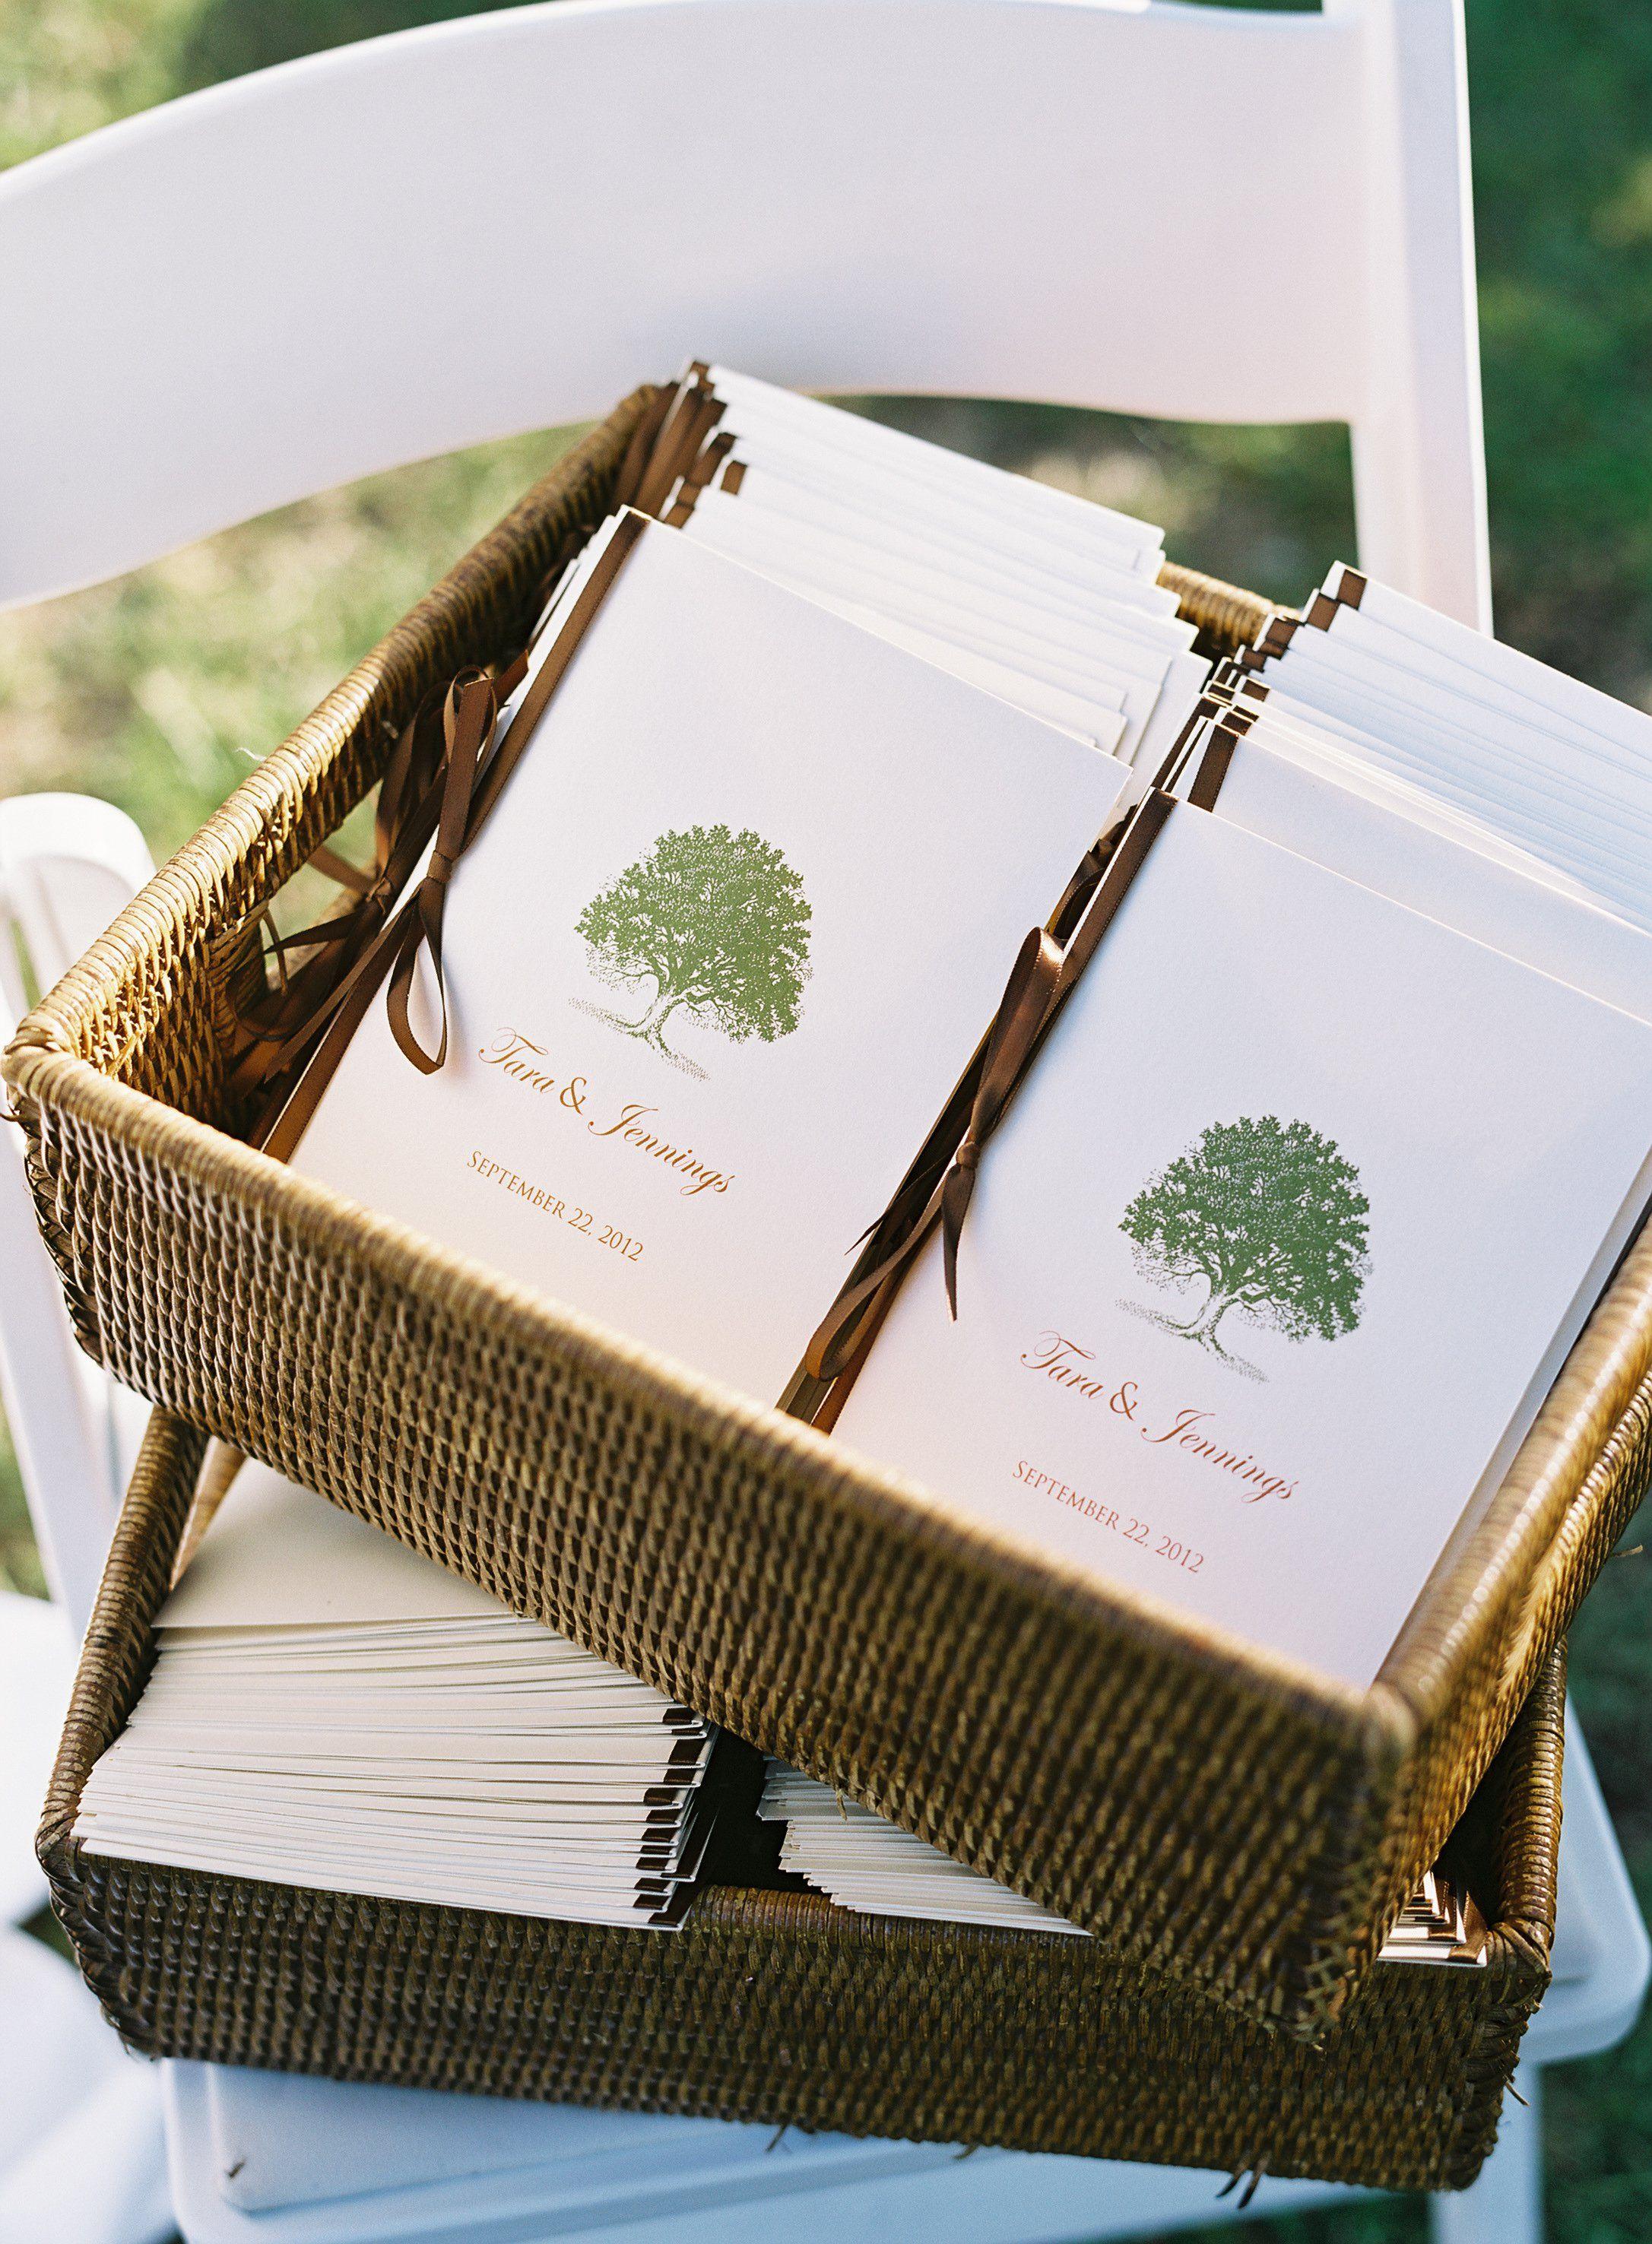 Tree Themed Wedding Programs | decoratiuni nunta | Pinterest | Tree ...